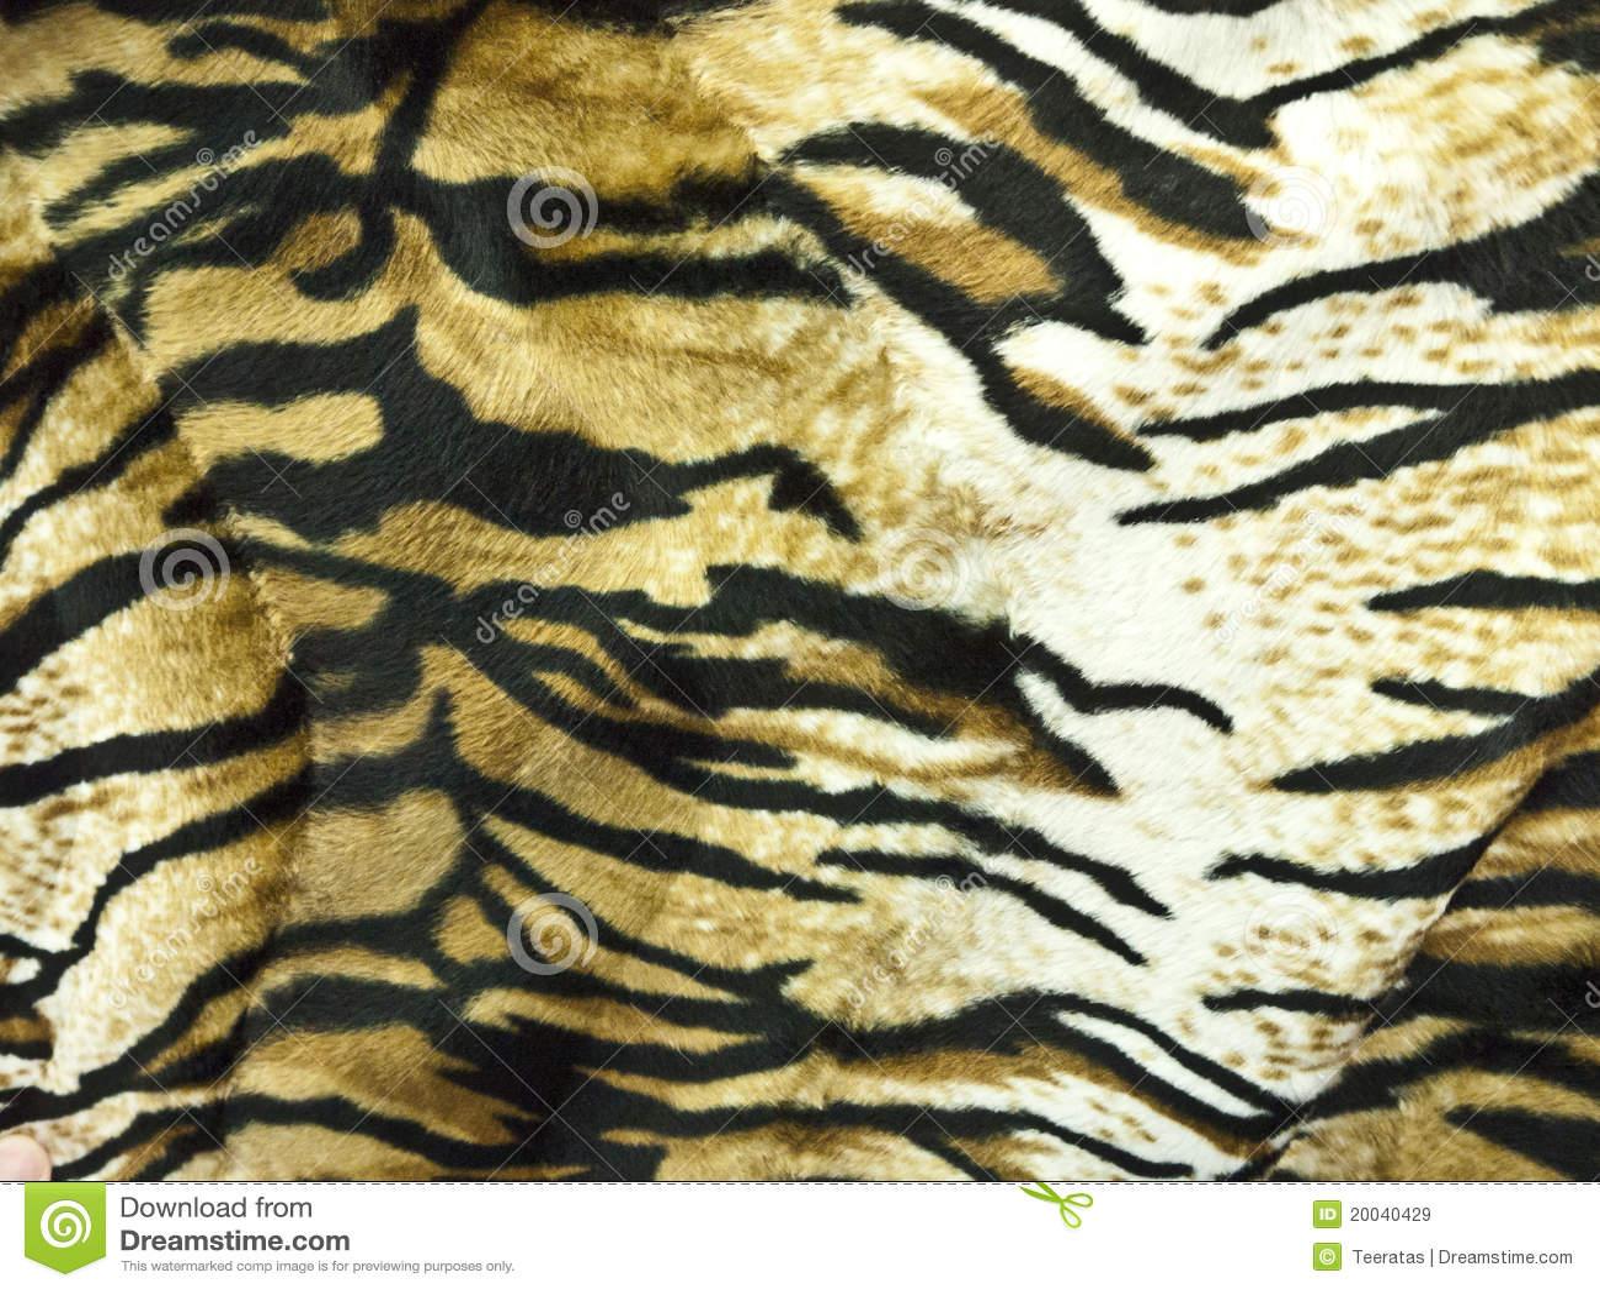 white tiger skin background - photo #20